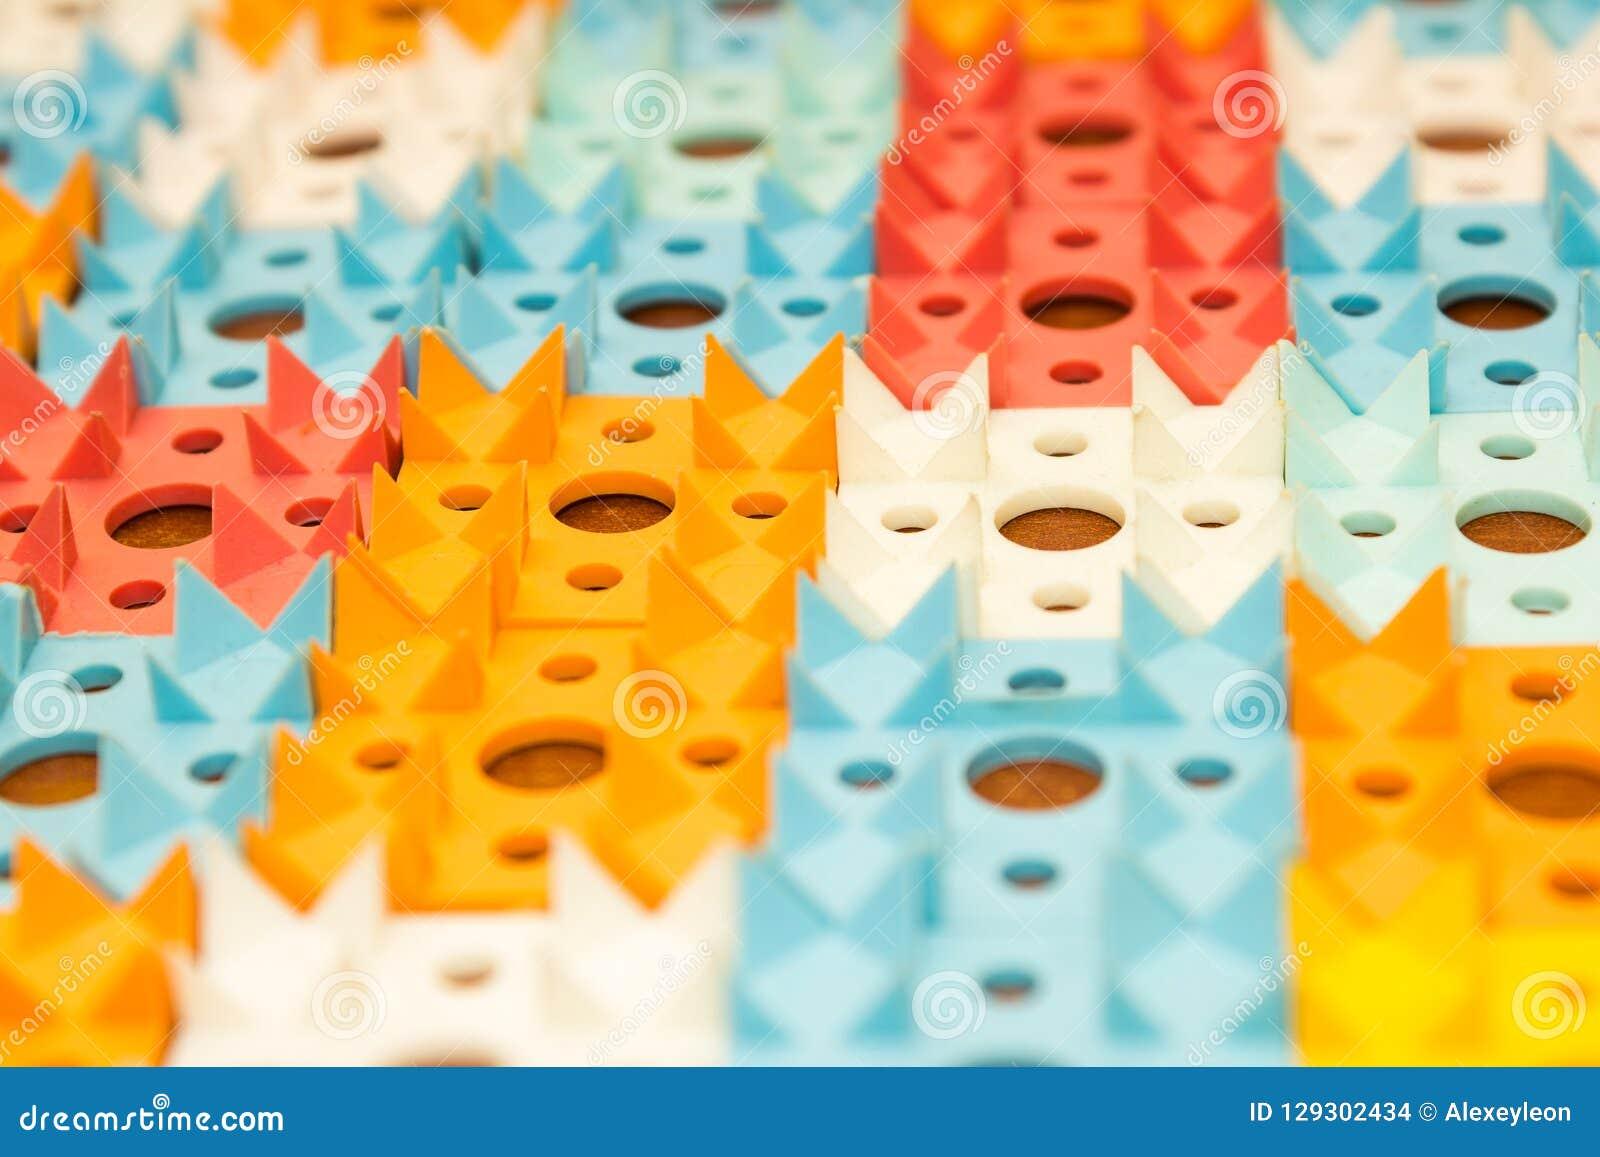 Applicateur de Kuznetsov - aiguilles multicolores en gros plan